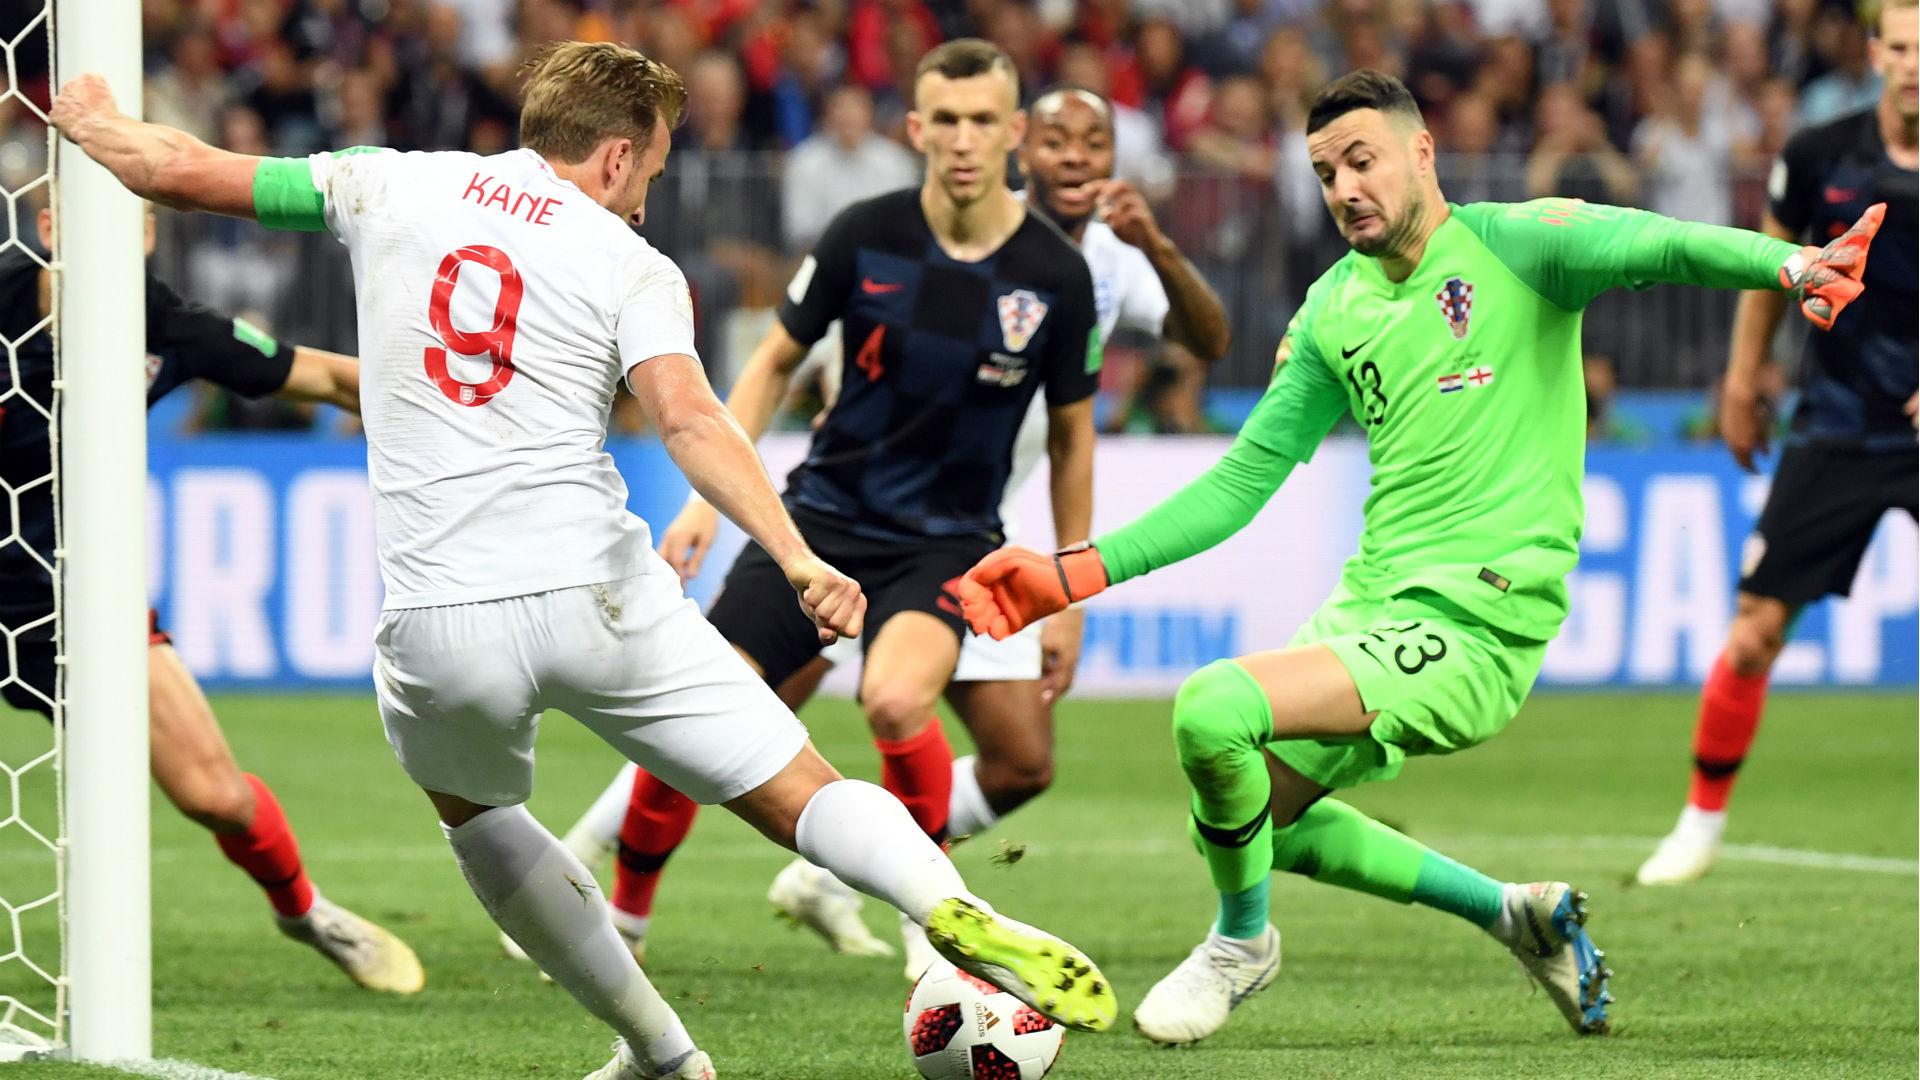 Kane Inglaterra Copa do Mundo 11 07 2018